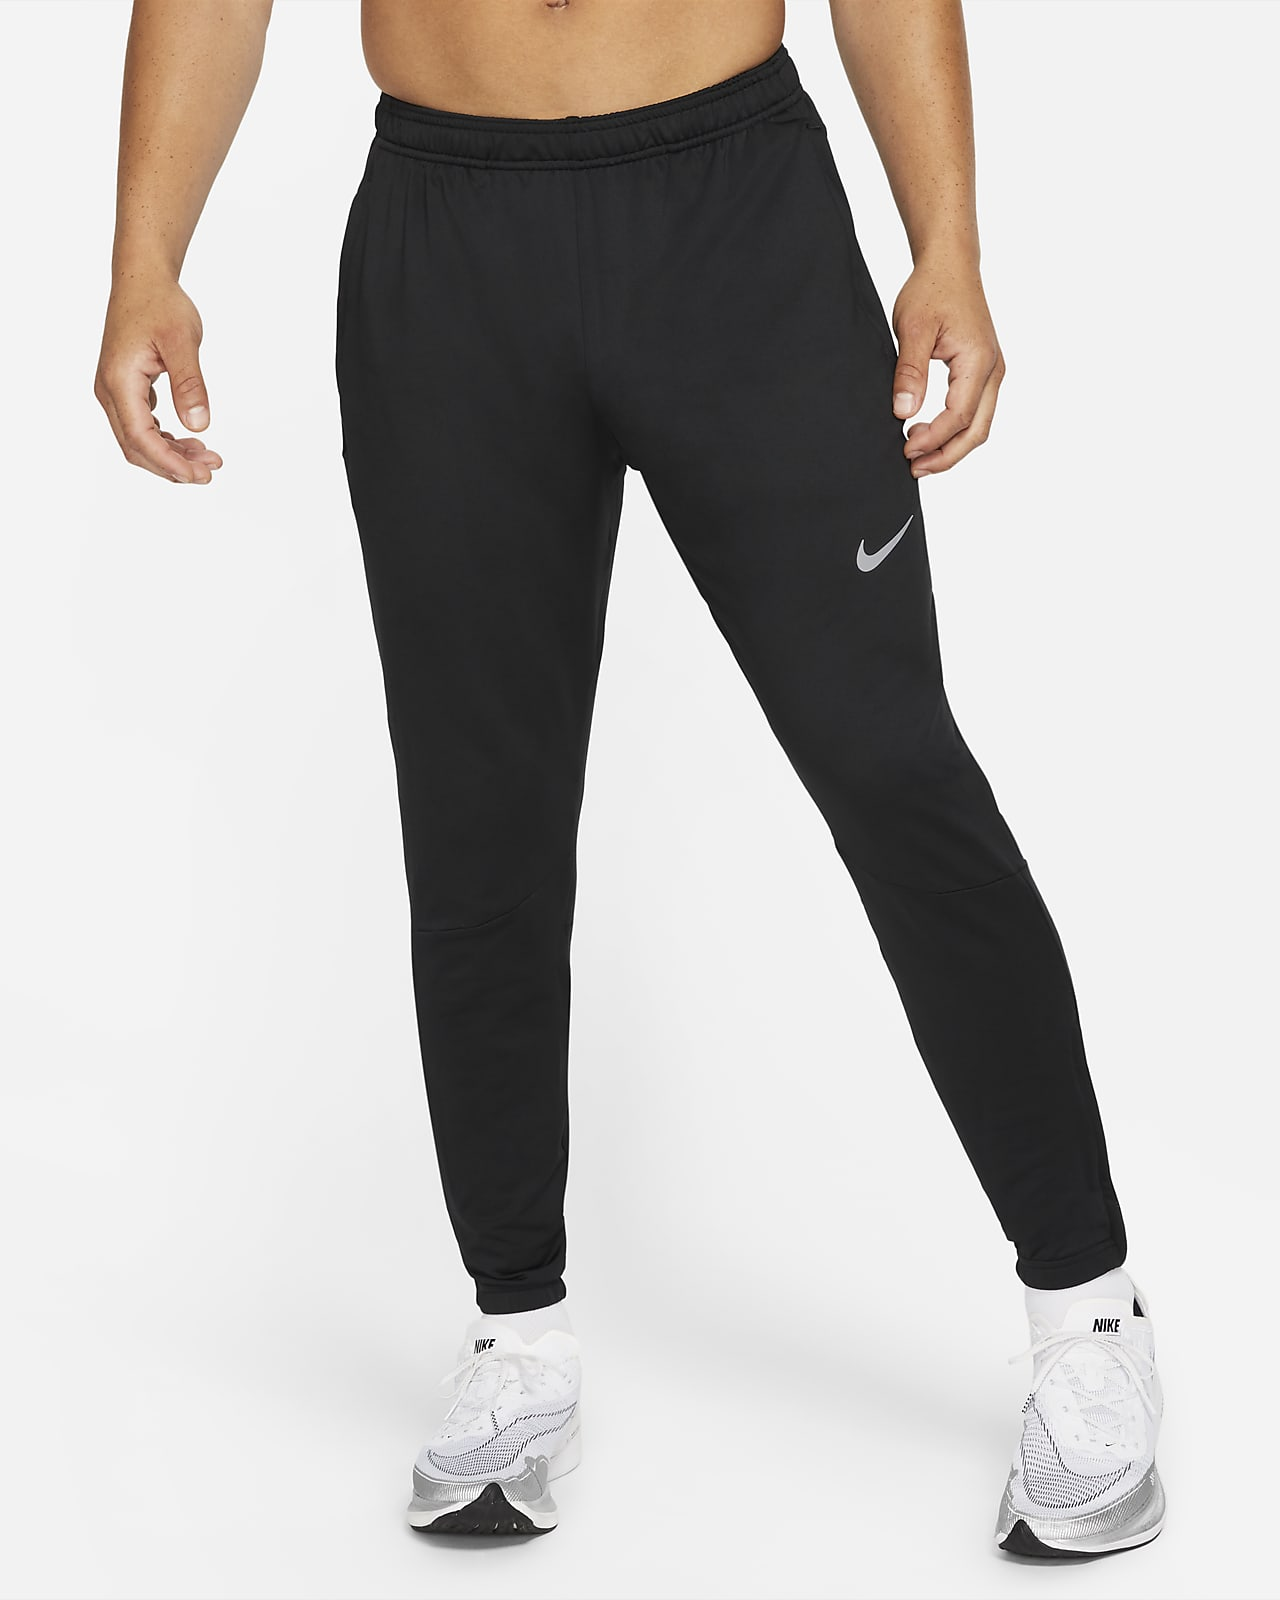 Nike Essential Men's Knit Running Pants